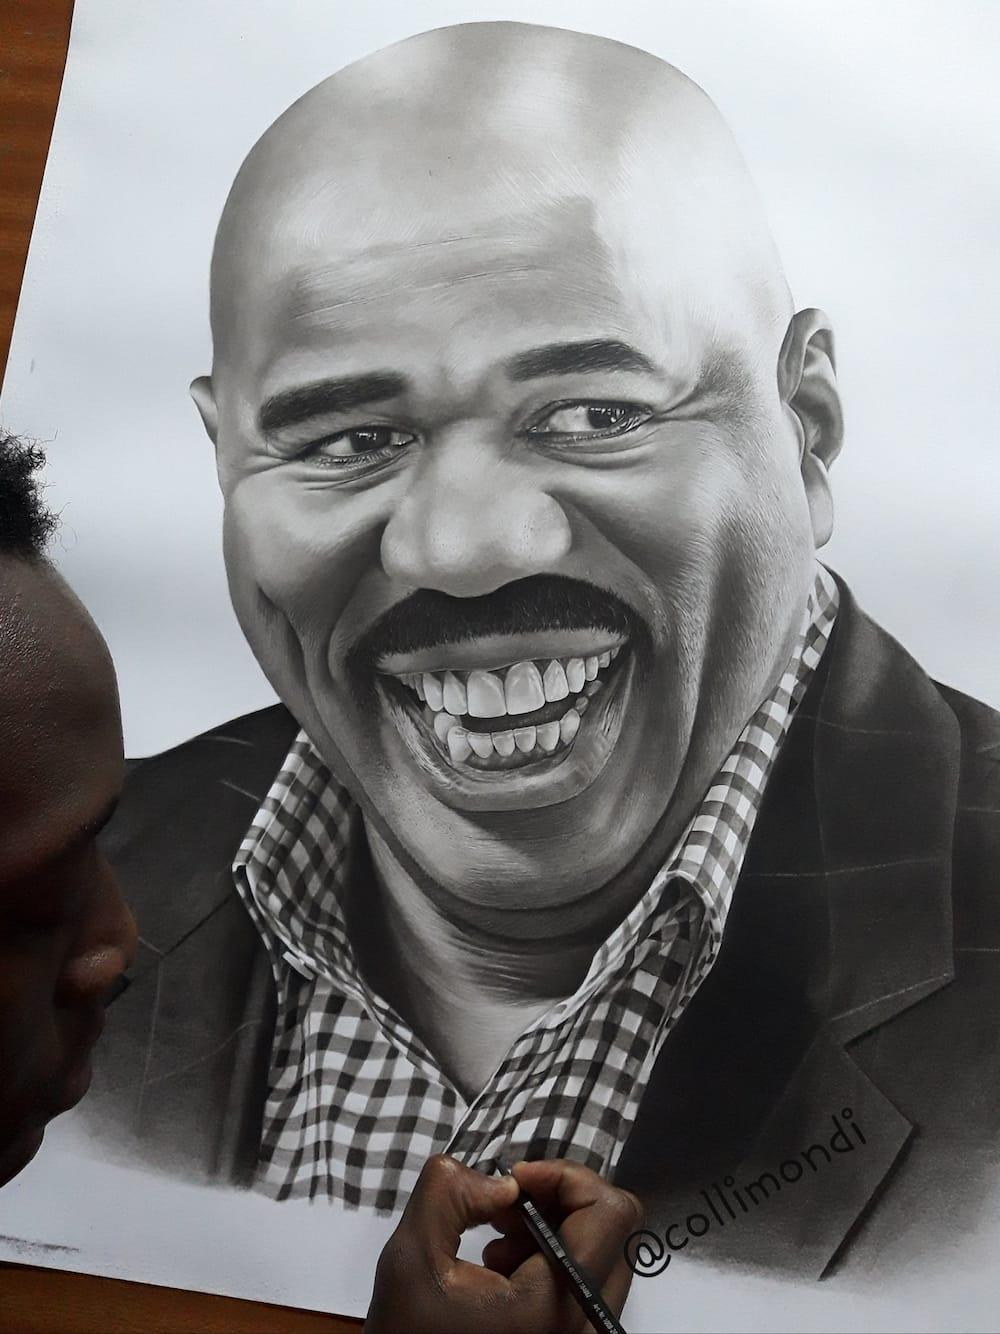 US comedian Steve Harvey to meet Kenyan pencil artist who drew his impressive portrait